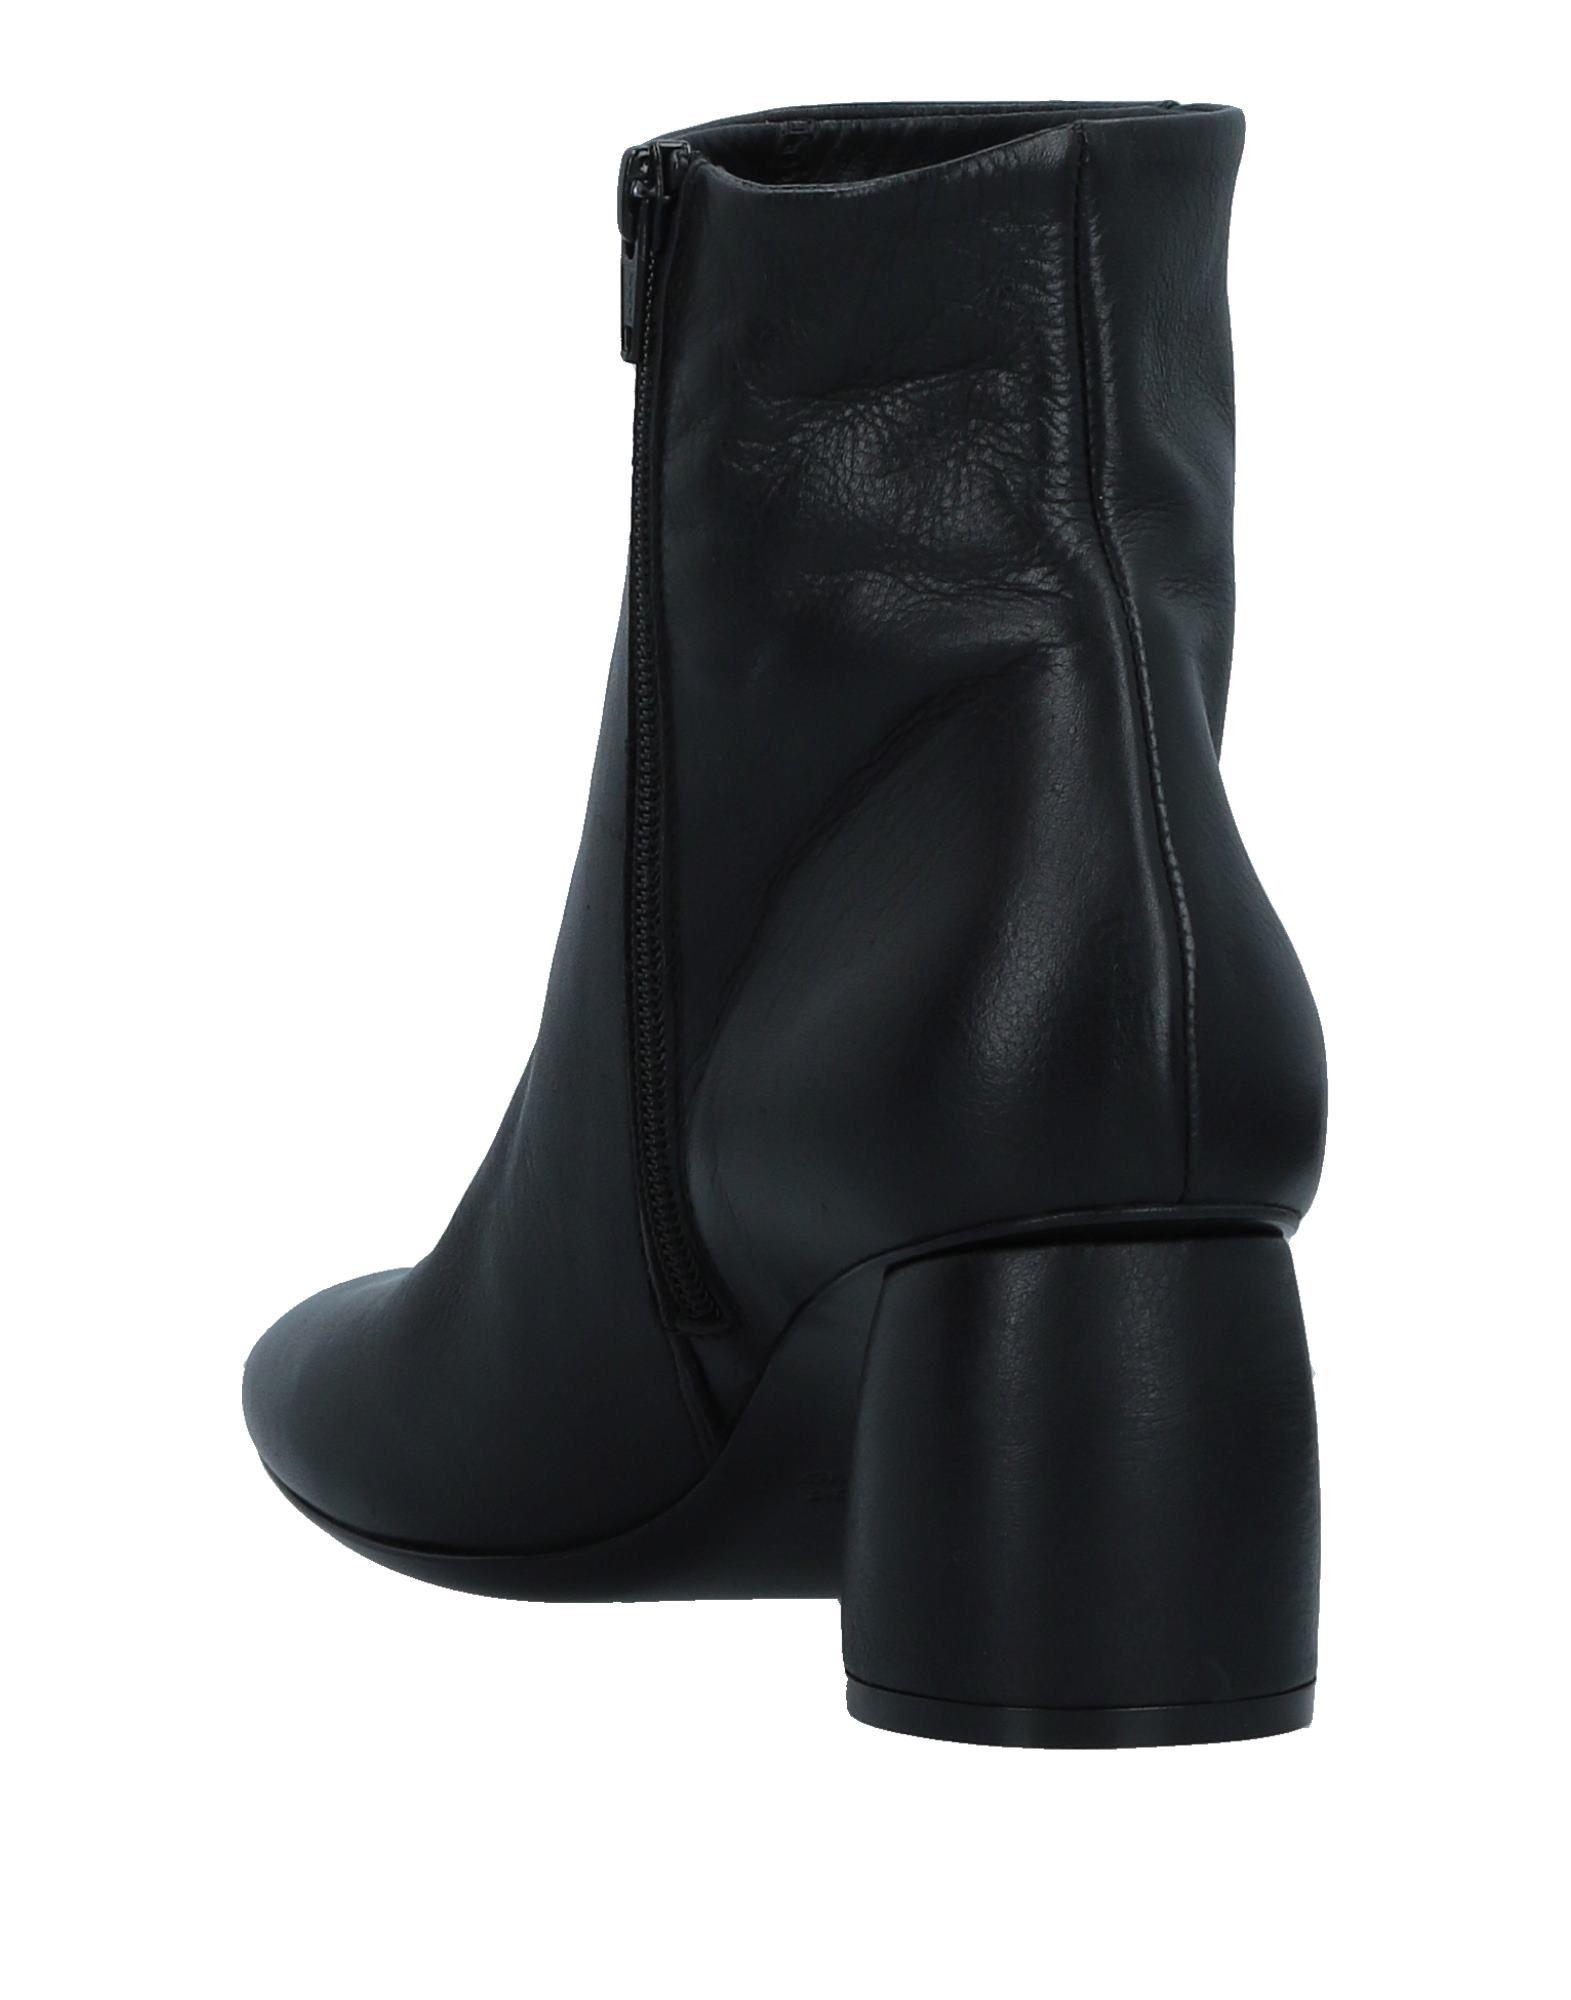 Strategia Stiefelette Damen Schuhe  11516758PFGut aussehende strapazierfähige Schuhe Damen f6d3d6